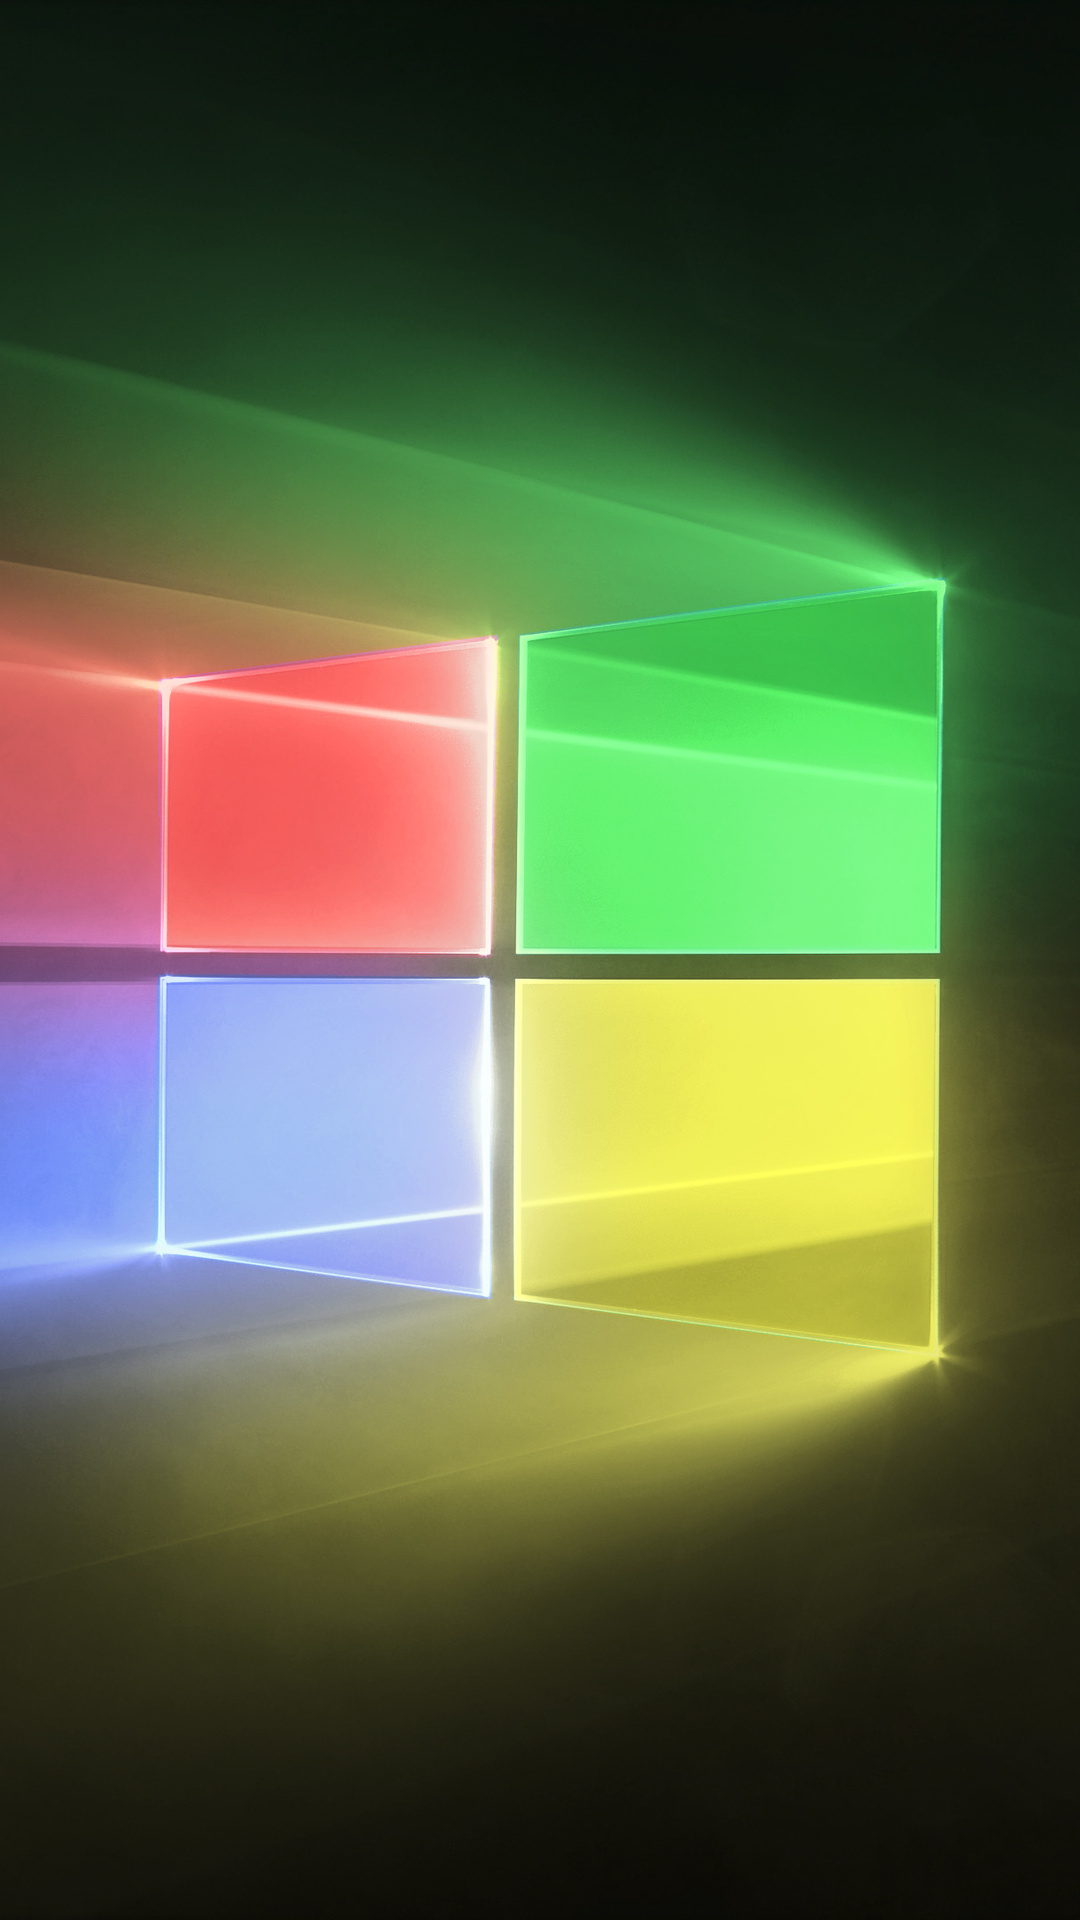 1080x1920 Windows 10 Abstract 4k Iphone 7,6s,6 Plus, Pixel ...